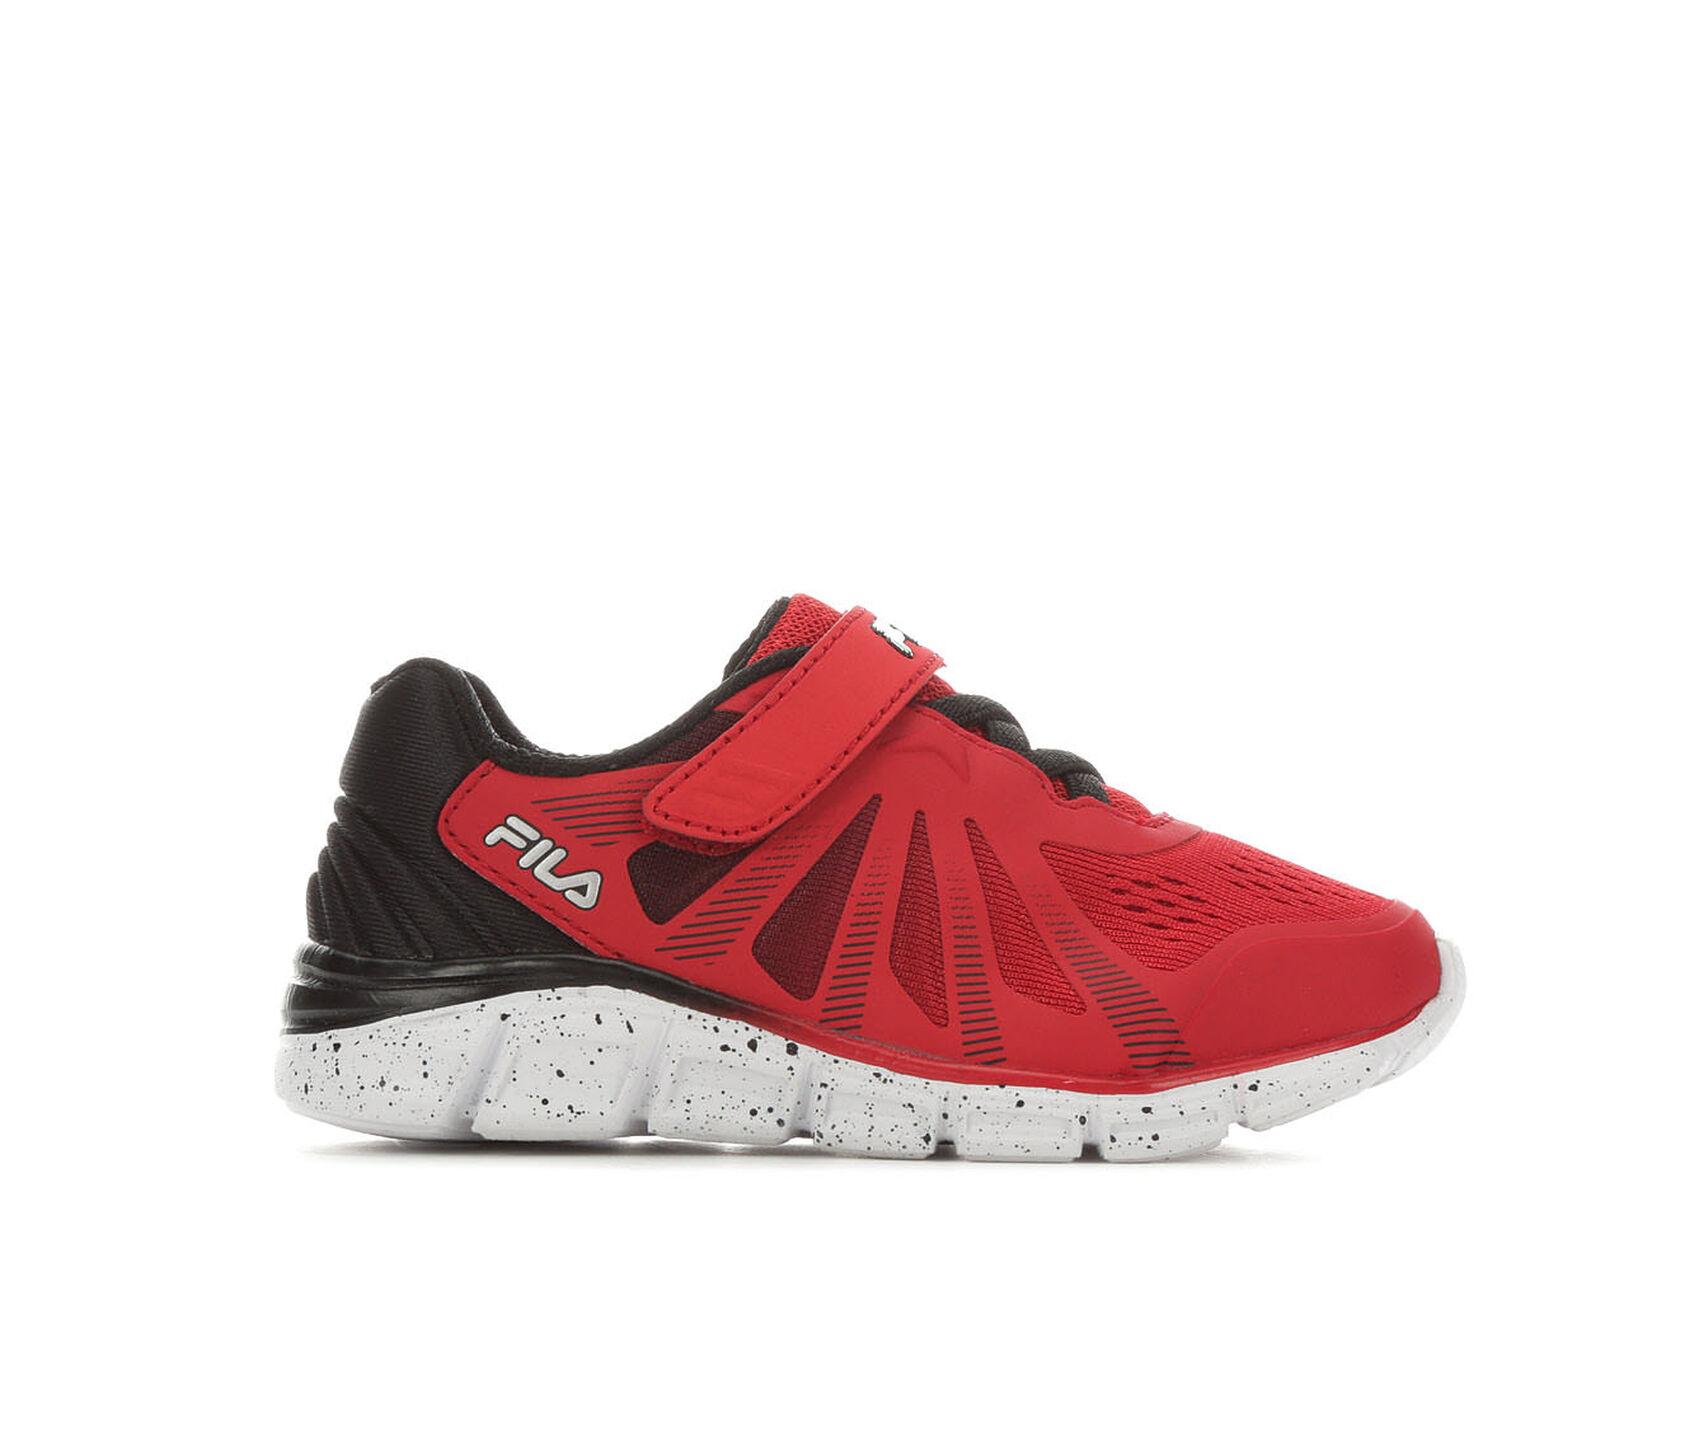 2d10684ce03a Boys  Fila Toddler Fraction 2 Strap Athletic Shoes